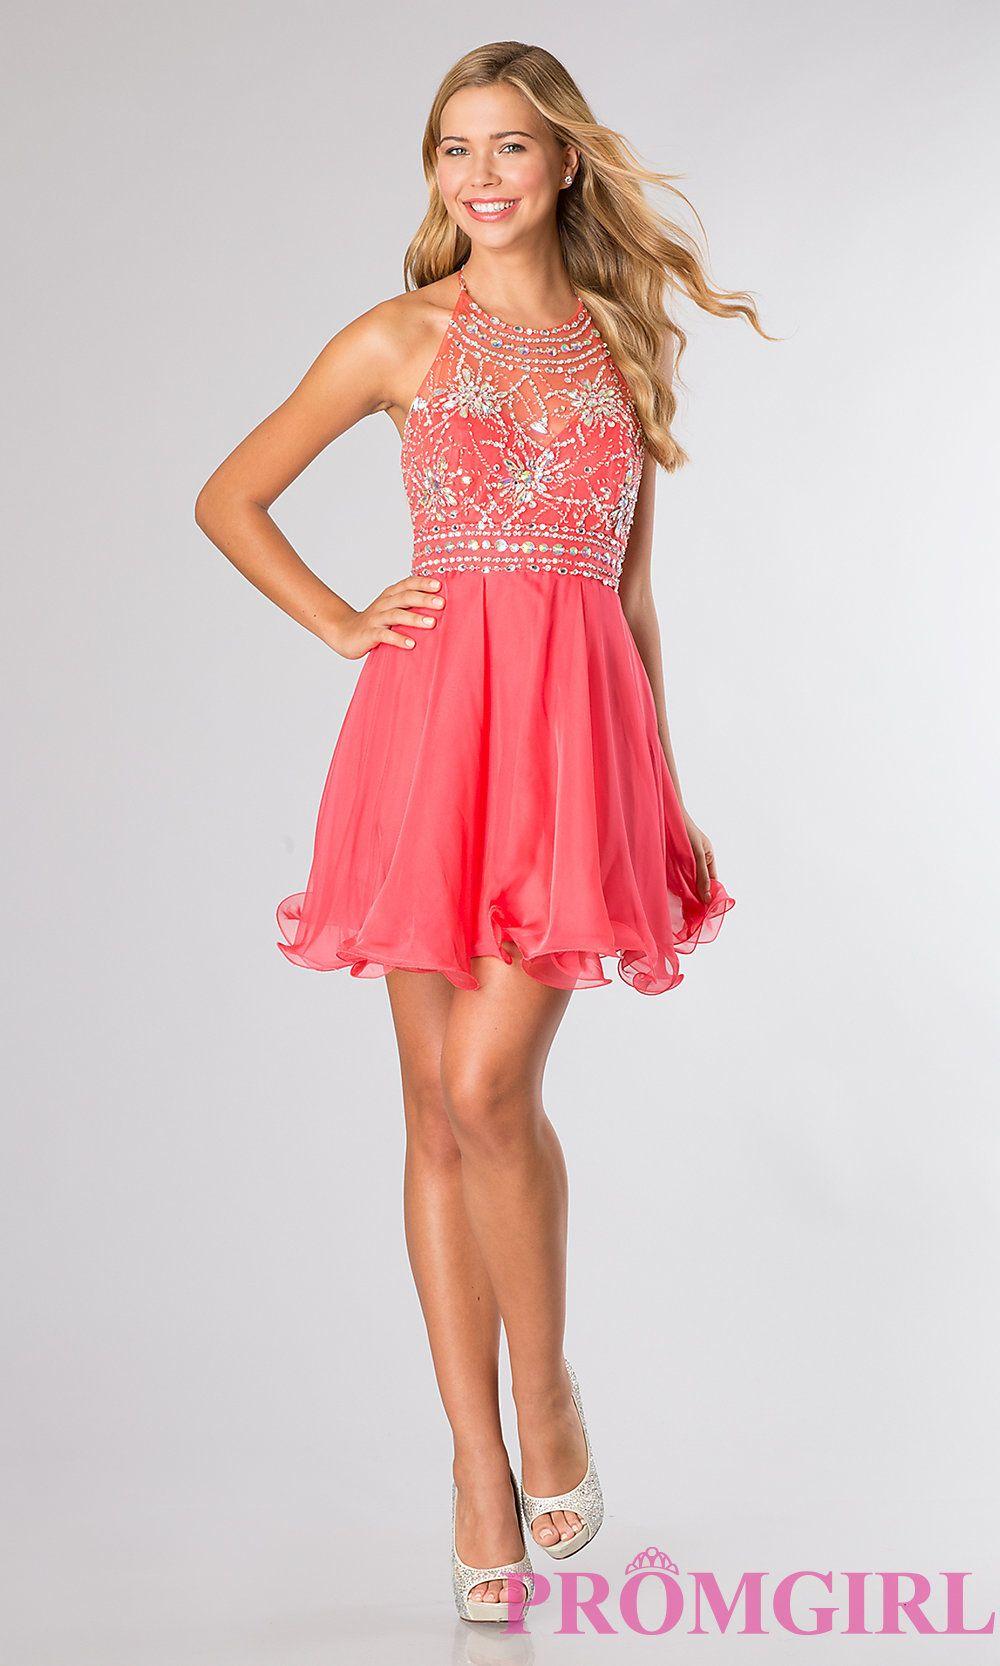 Blush Short Halter Top Homecoming Dress-PromGirl | Dresses ...